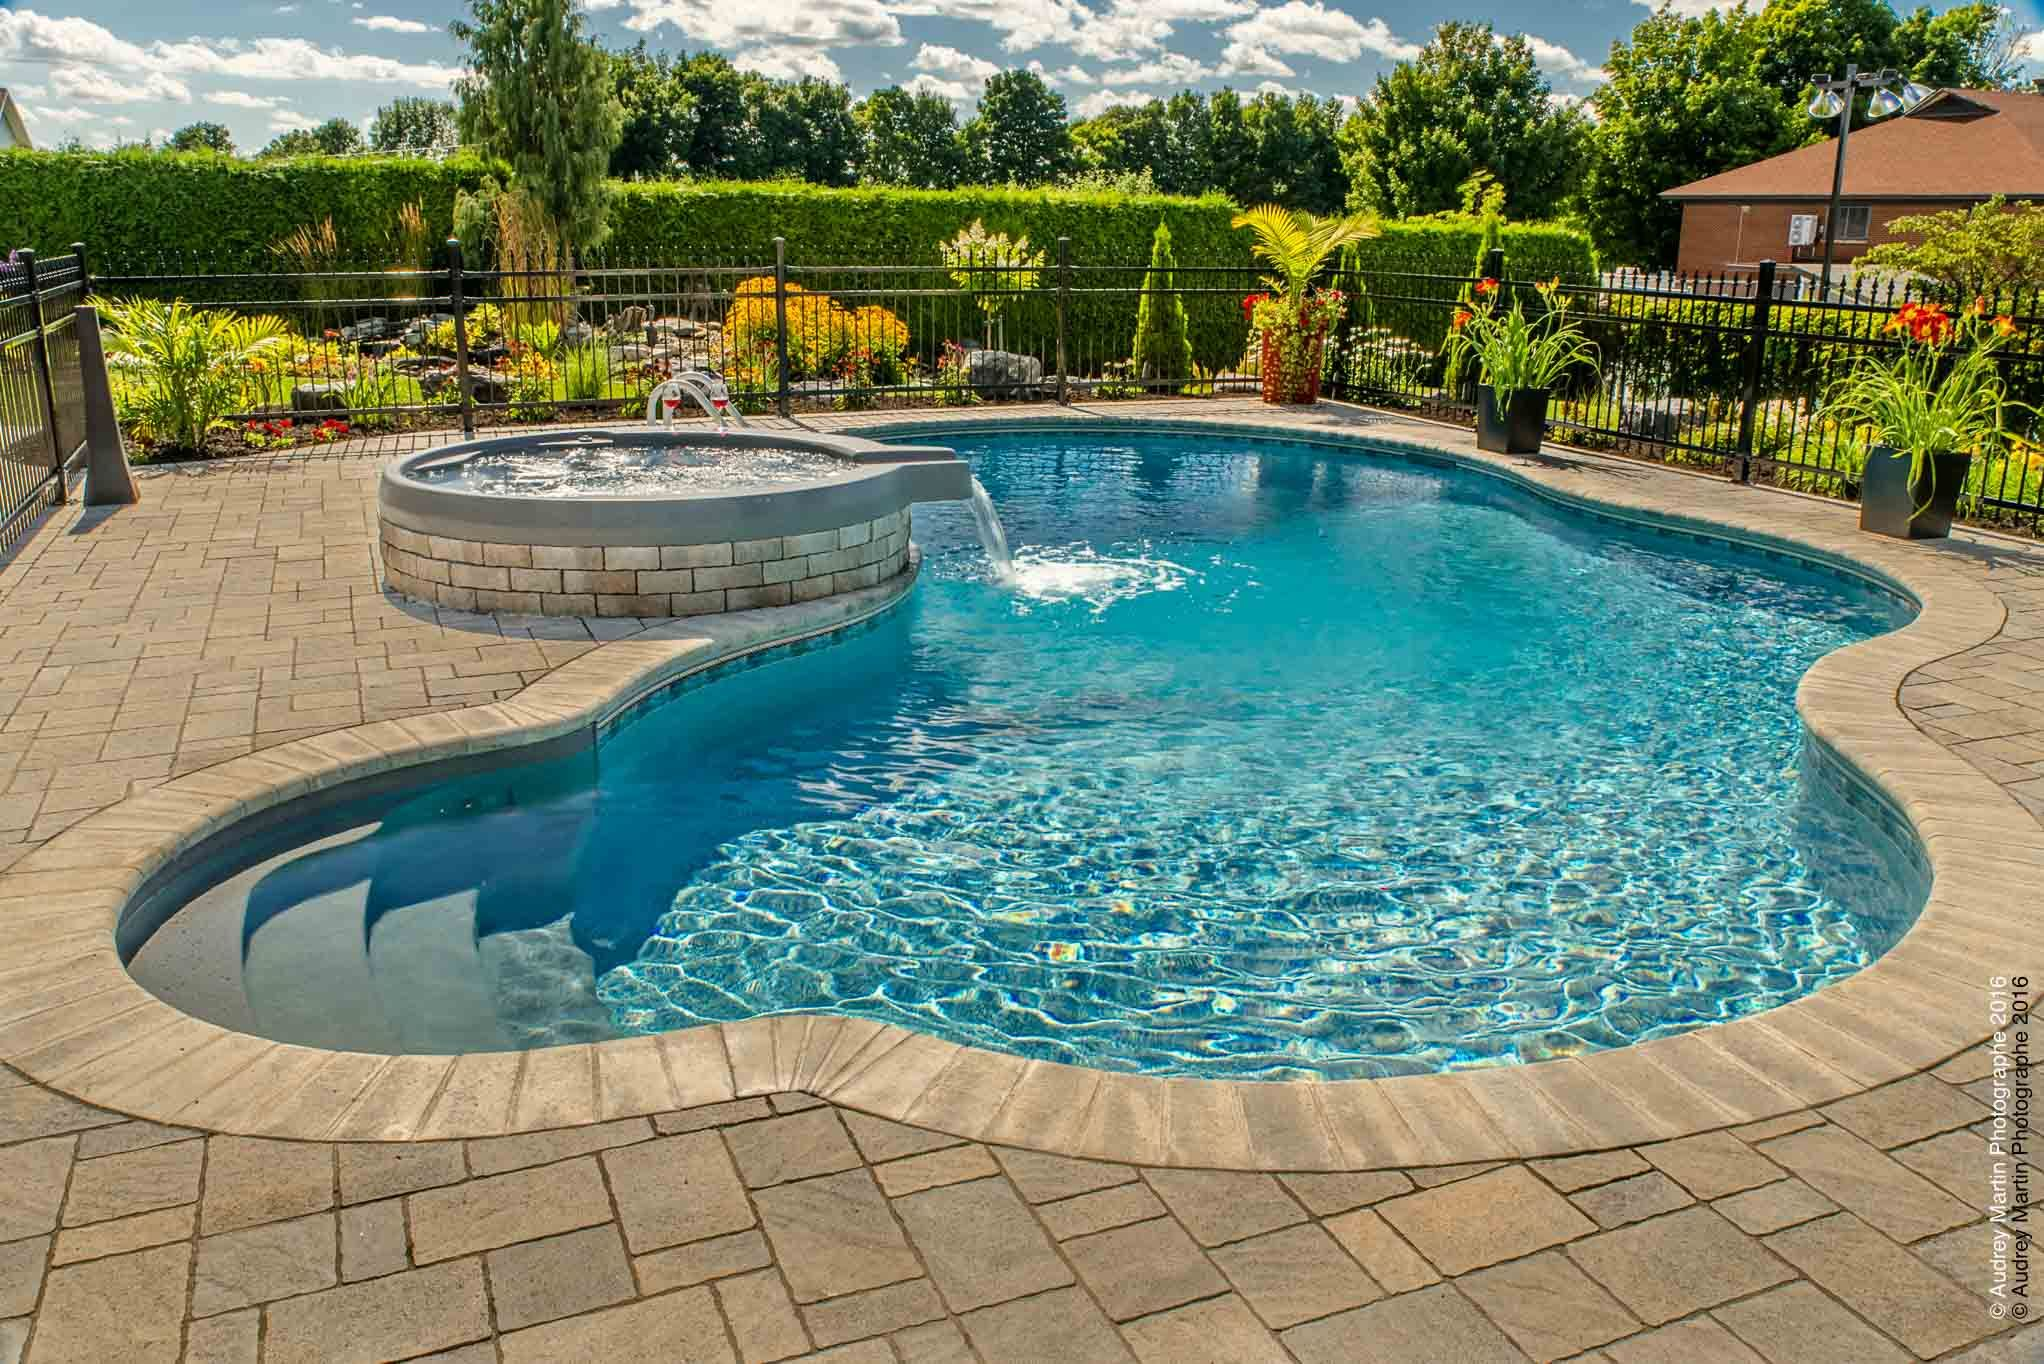 piscine creus e spa d versent zone foyer cl ture pav. Black Bedroom Furniture Sets. Home Design Ideas